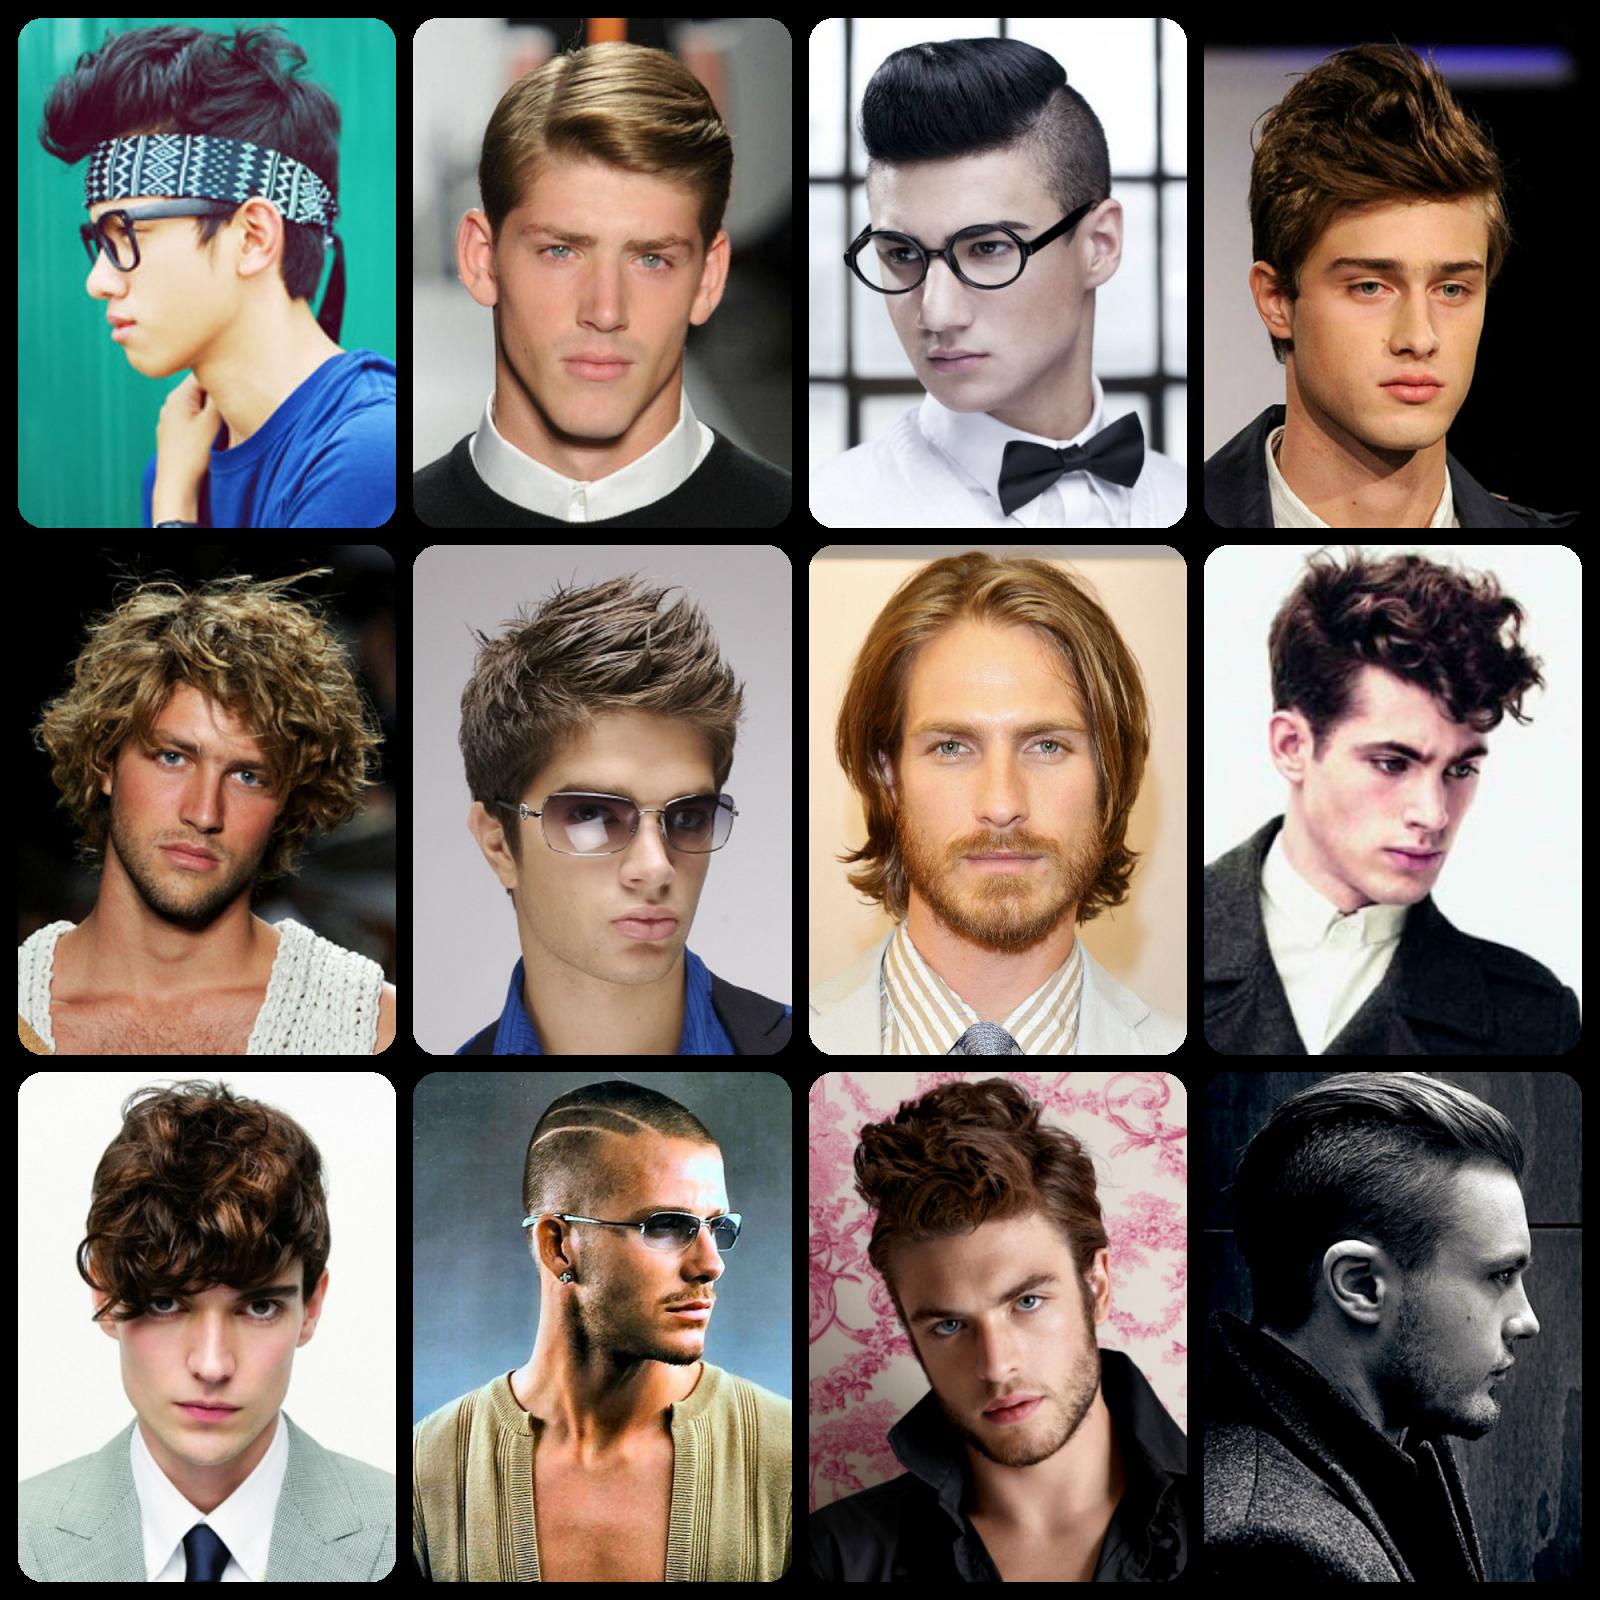 Pleasant List Of Men Hairstyles Dogs Cuteness Hairstyle Inspiration Ideas Short Hairstyles Gunalazisus